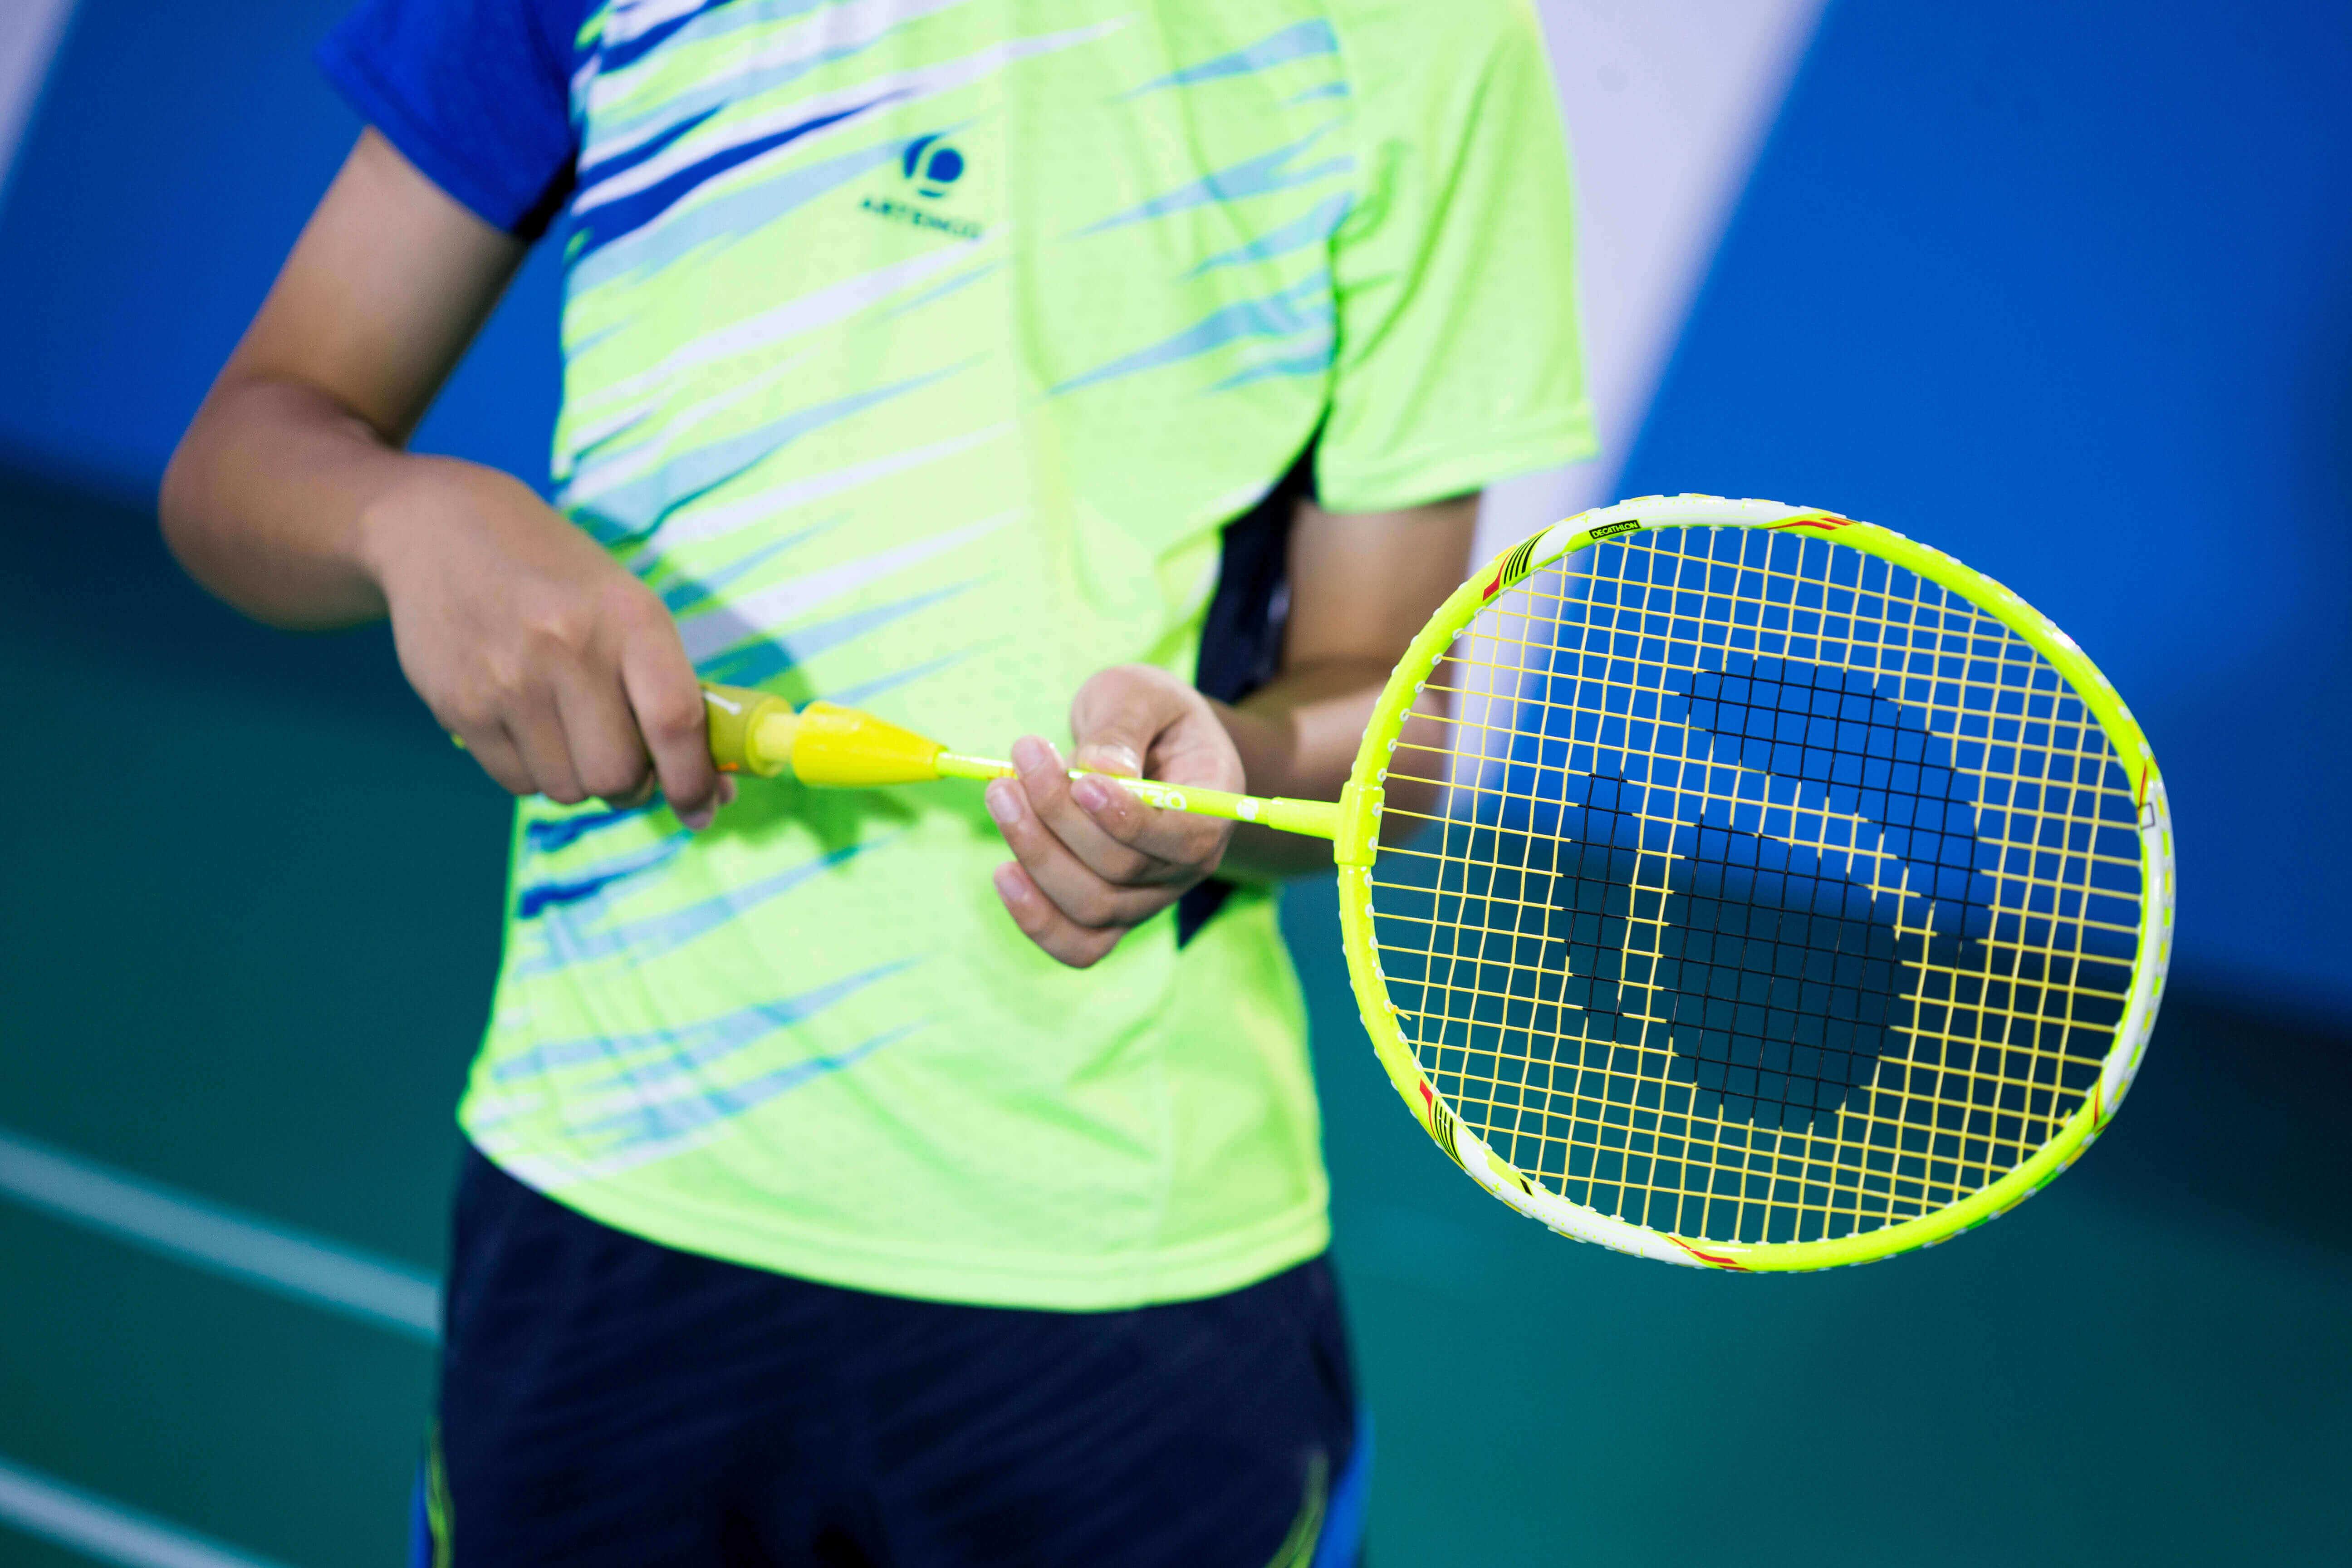 Badminton Racket Maintenance - The Do's and Don'ts